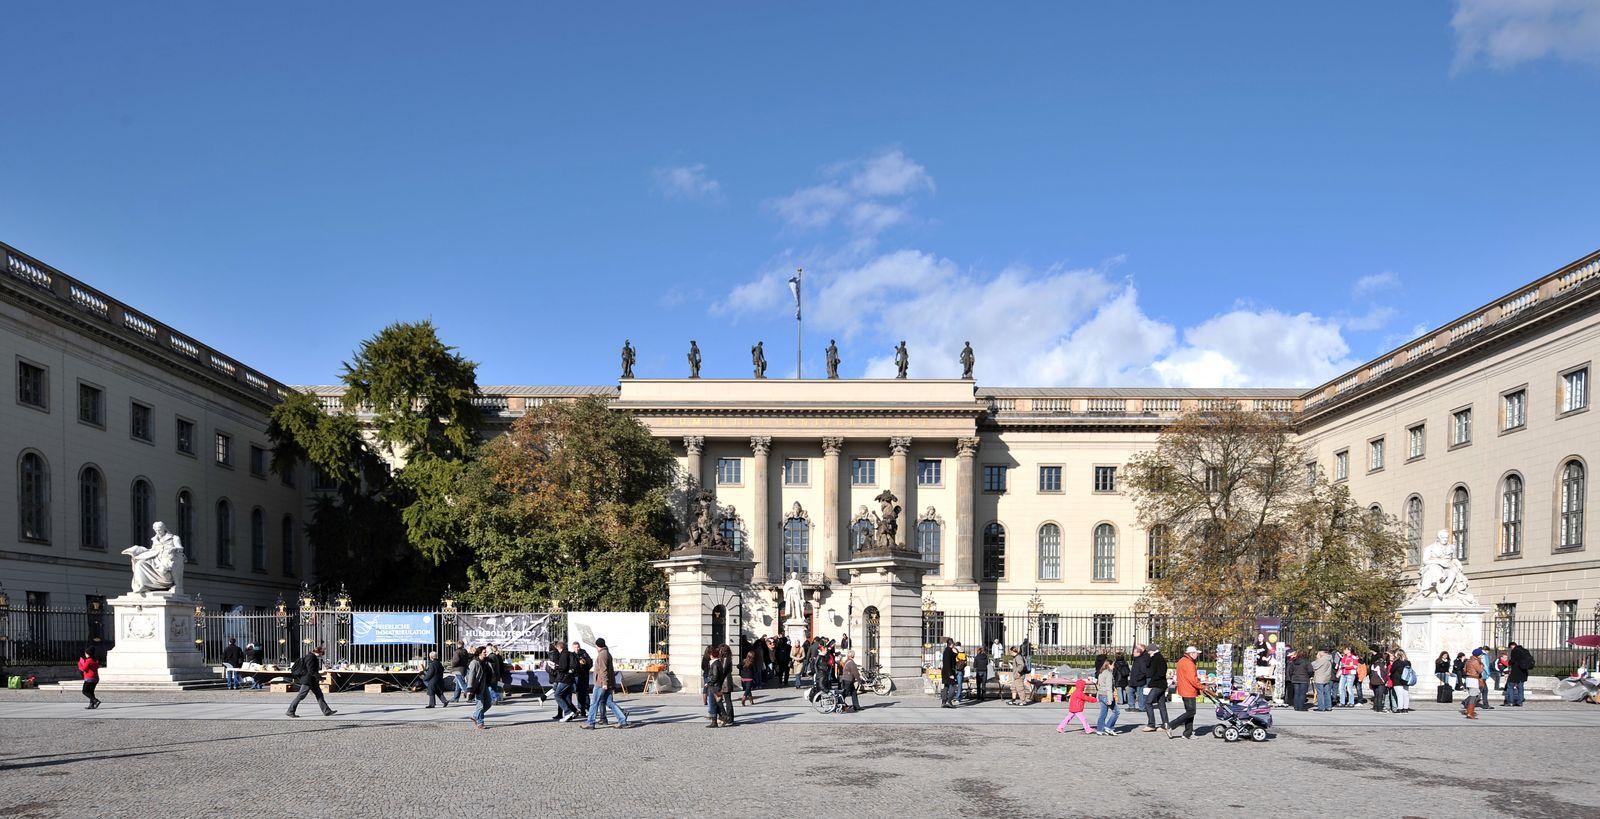 Humboldt Universität Berlin /Studenten Universität Campus / 10 beste Unis Deutschland